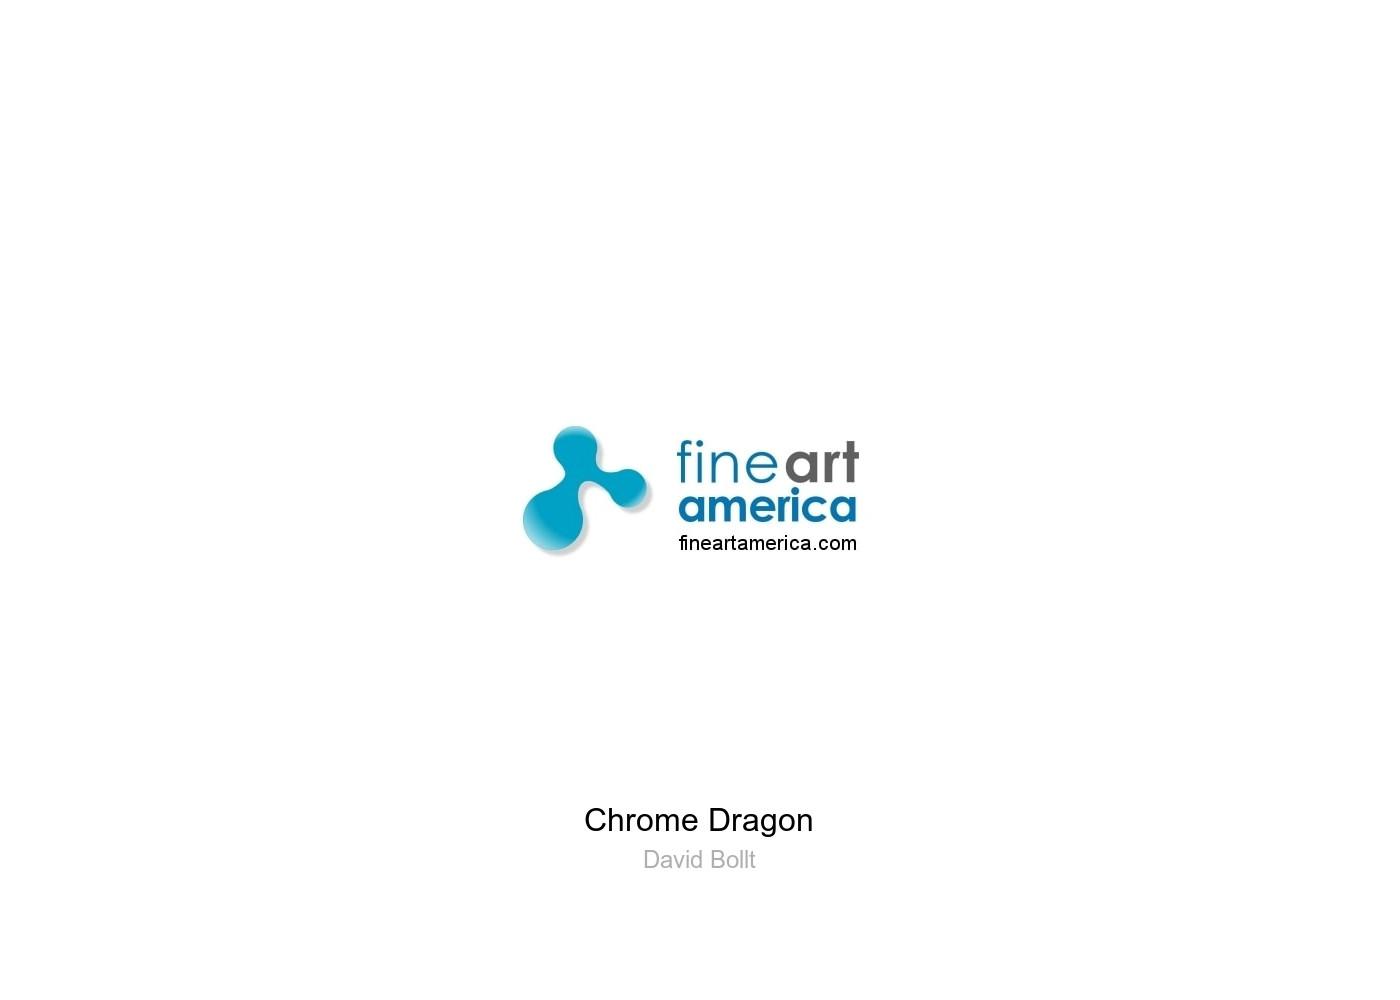 ac0d79ac1fb Chrome Dragon Greeting Card for Sale by David Bollt